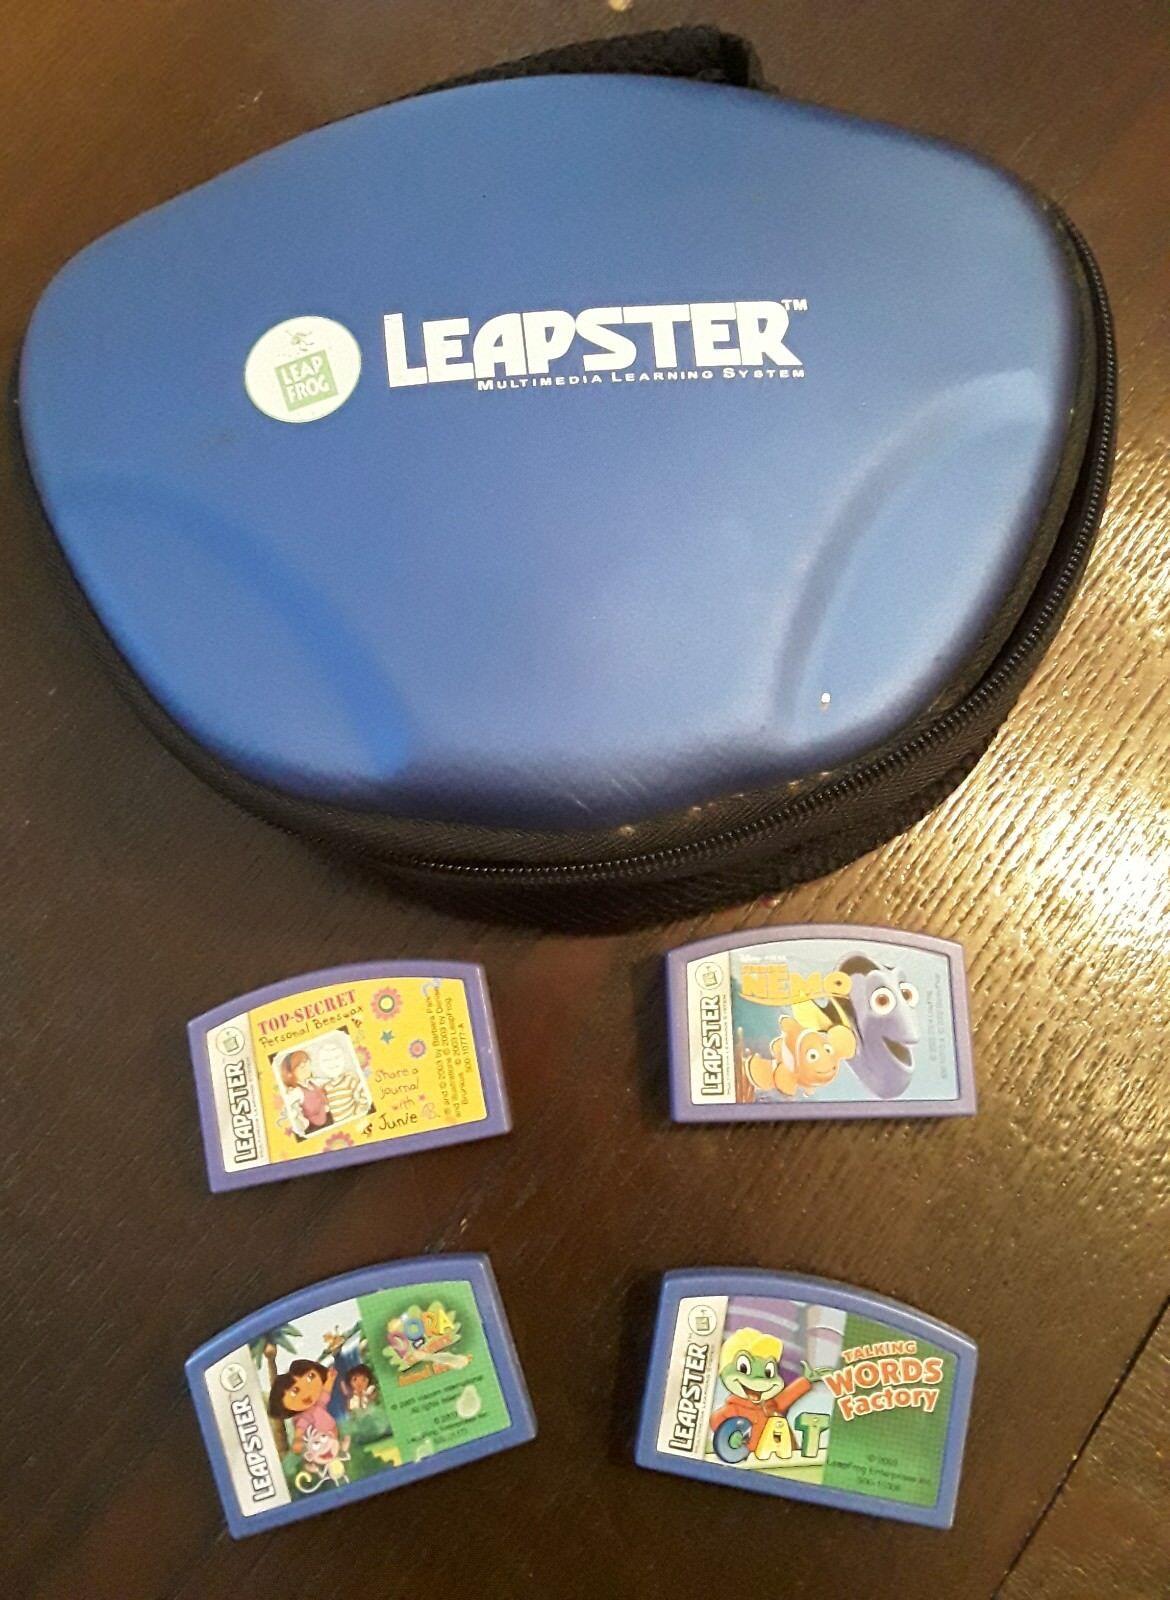 Lot Of 4 Leapster Games Cartridges + Case Nemo, Dora, Word Factory, Top Secret